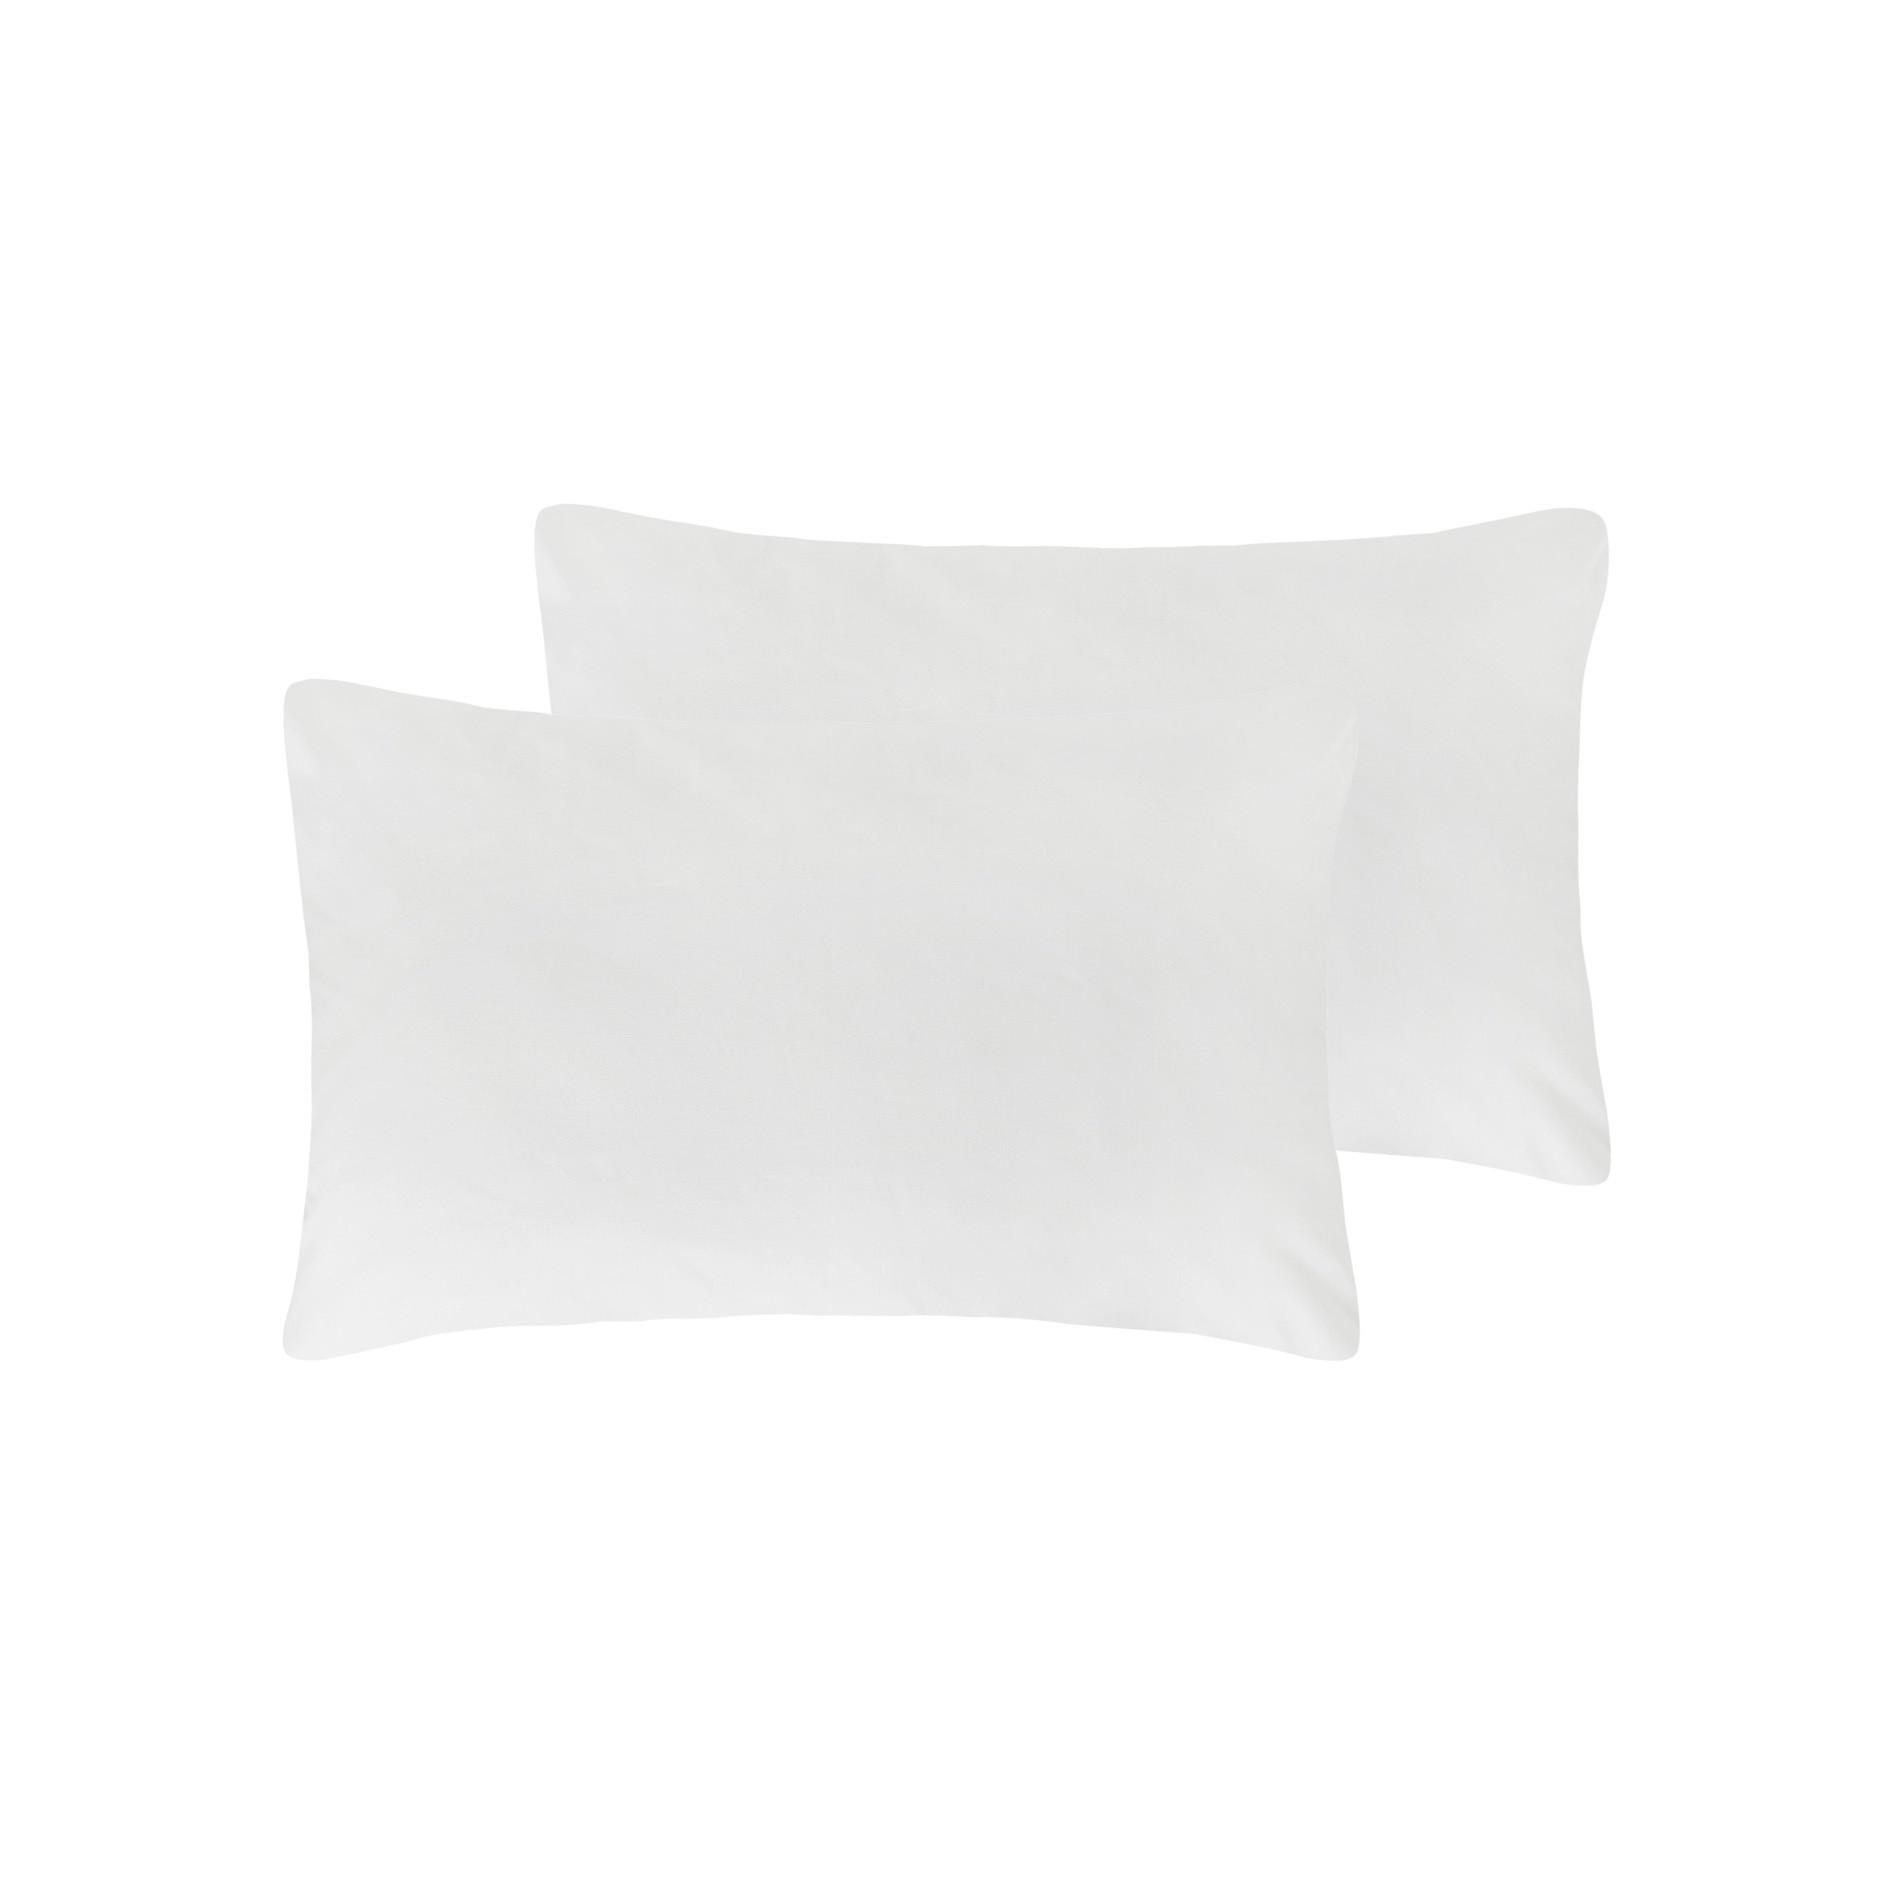 Coppia di copriguanciali puro cotone, Bianco, large image number 0